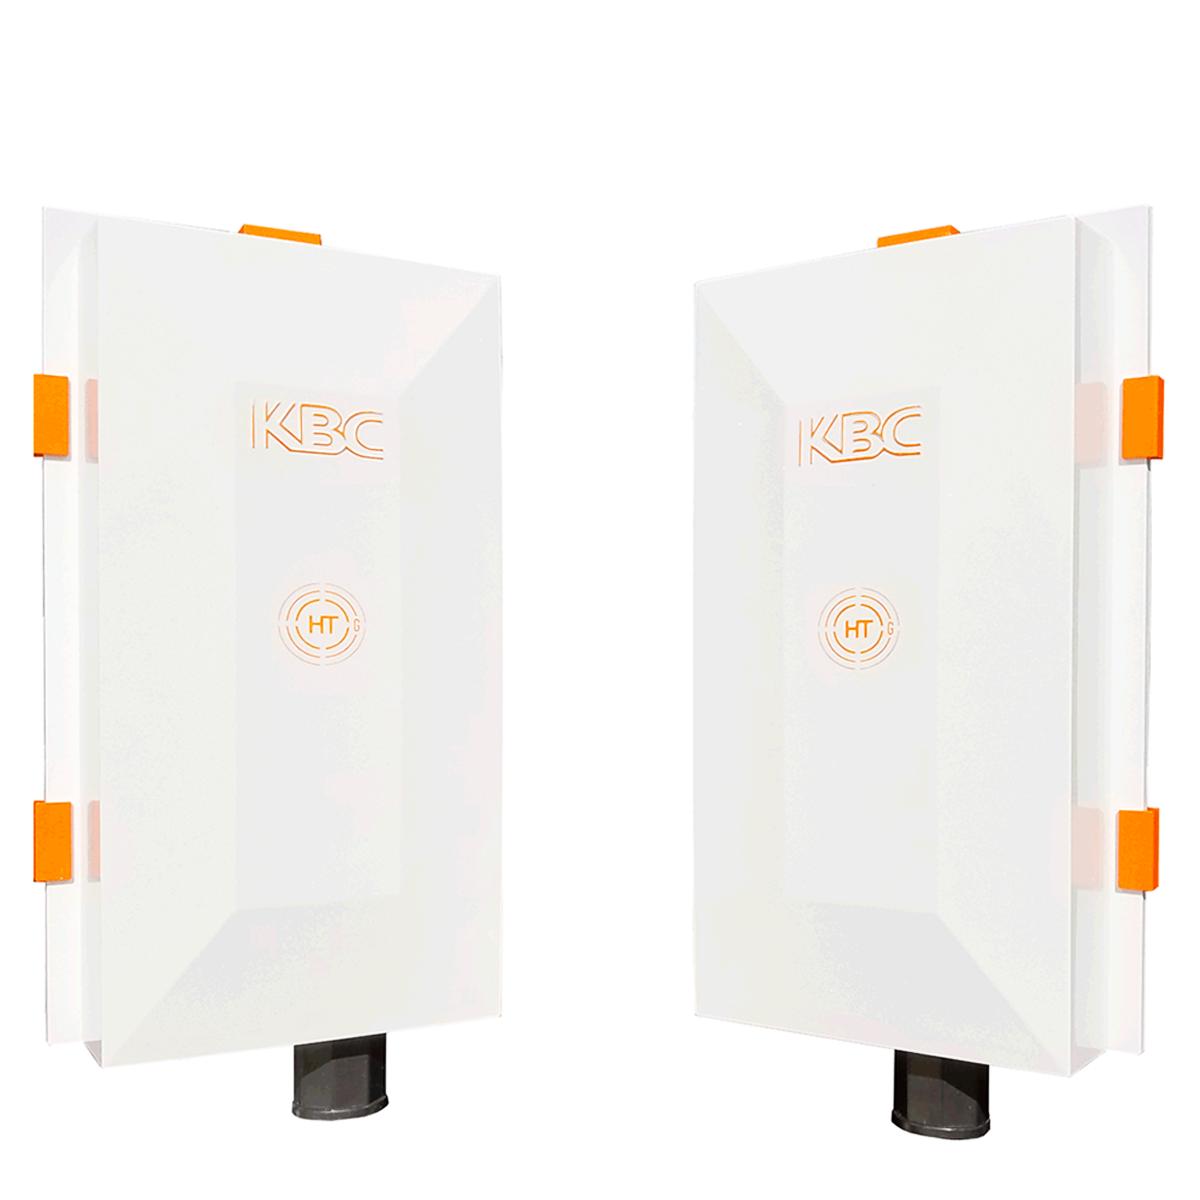 Wireless---WES3-HTG